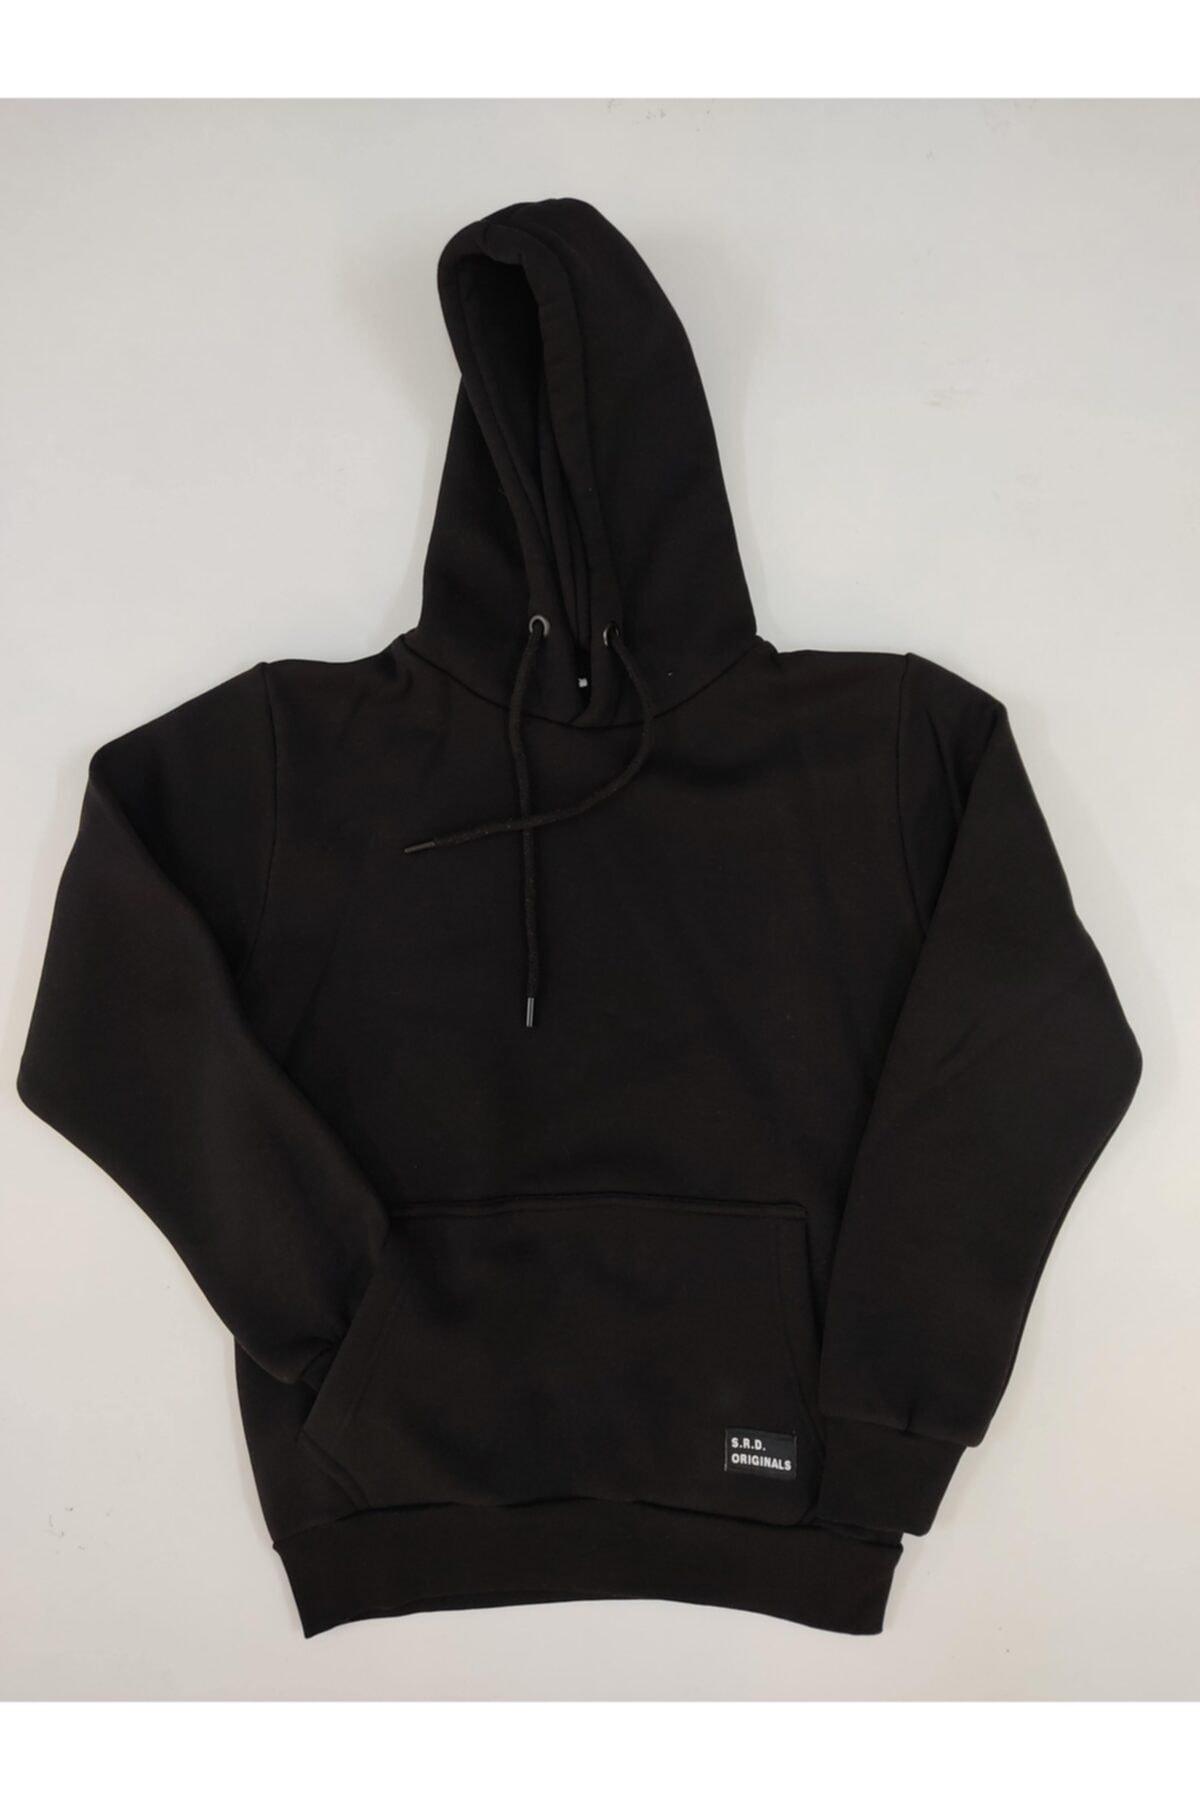 Basic Edition Kadın Sweatshirt